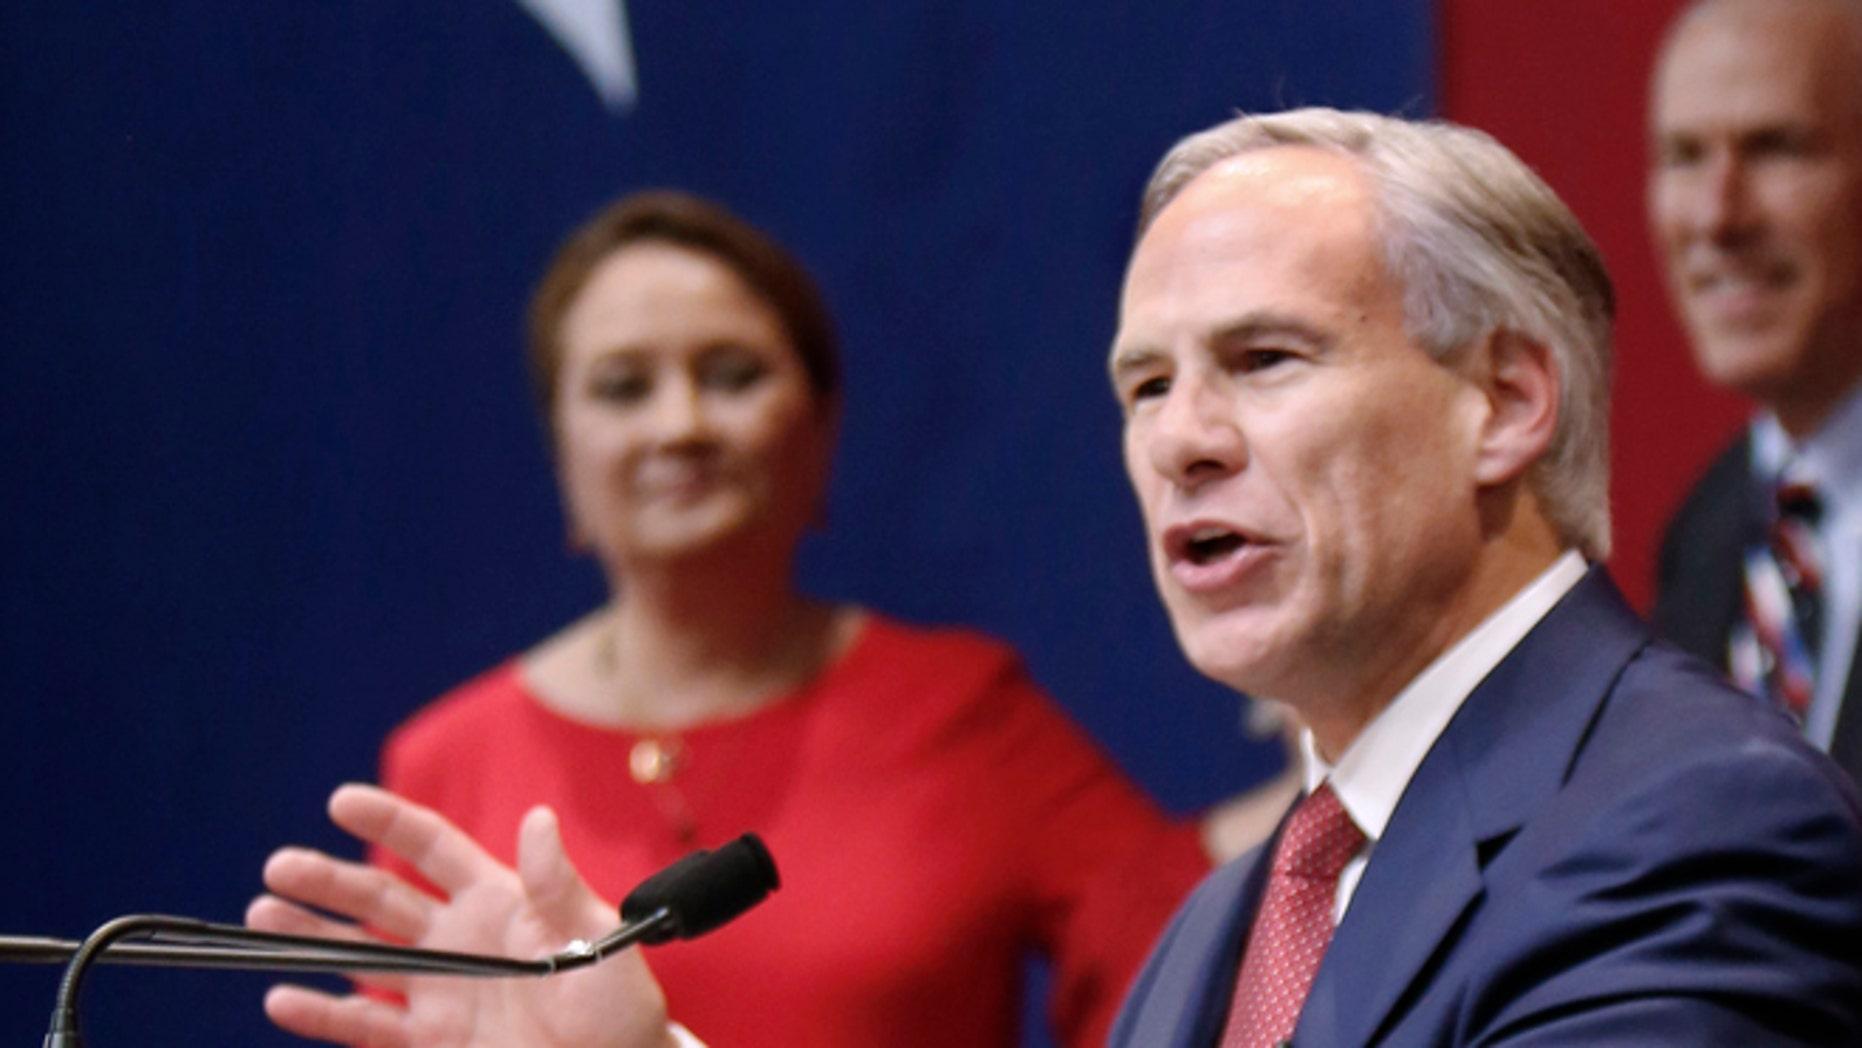 AUSTIN, TX - NOVEMBER 4:  Texas Governor-elect Greg Abbott speaks during his victory party on November 4, 2014 in Austin, Texas. Abbott defeated Democratic challenger Texas State Sen. Wendy Davis. (Photo by Erich Schlegel/Getty Images)